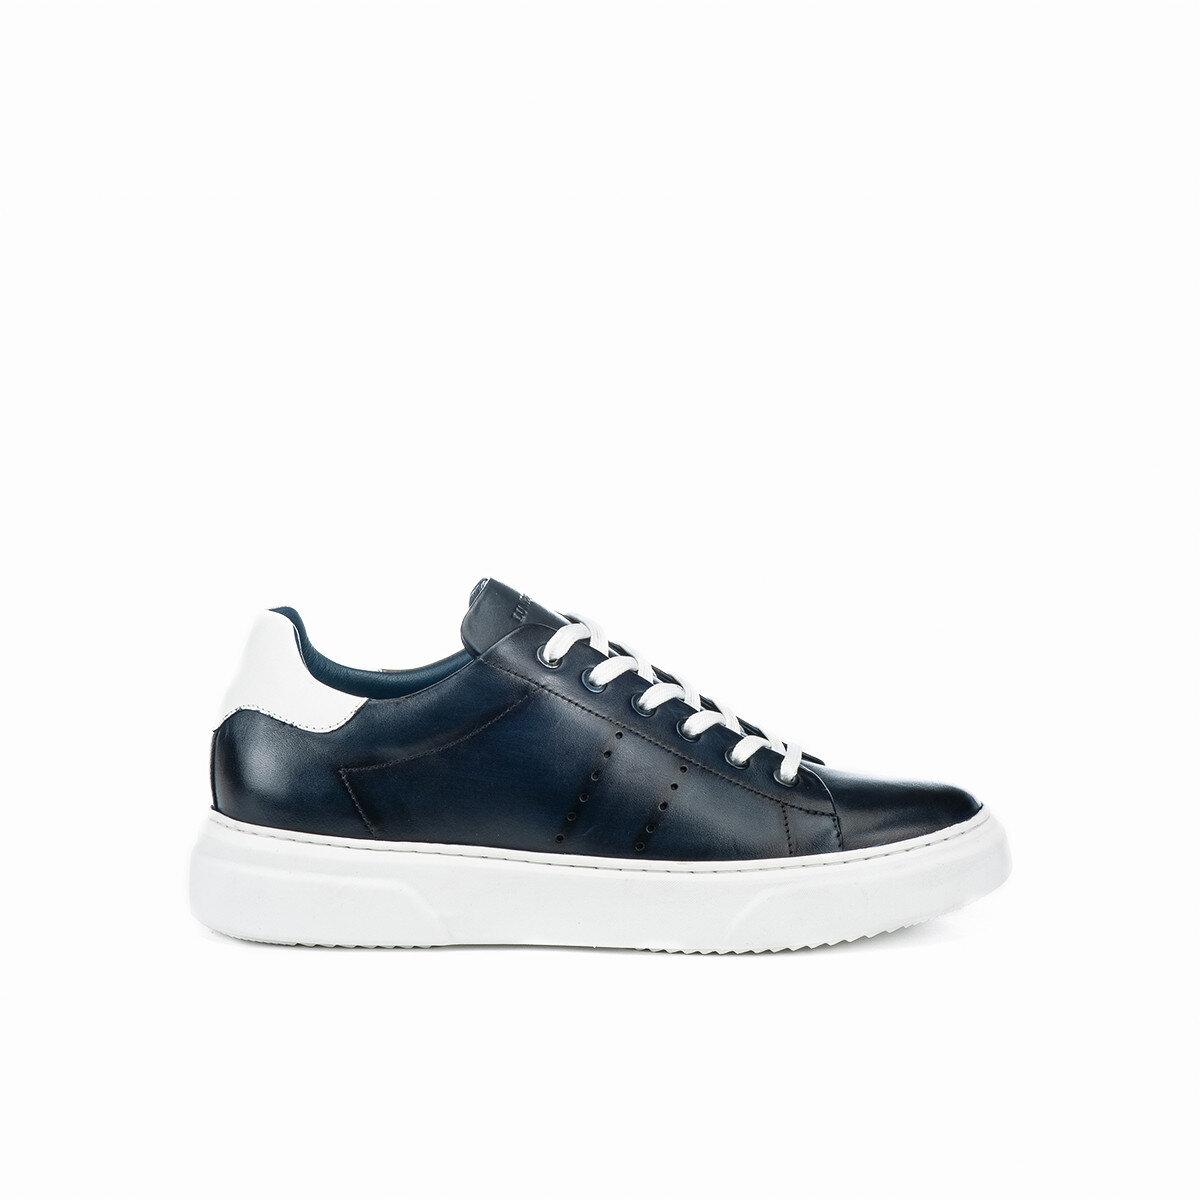 JOHNSON Sneakers Uomo